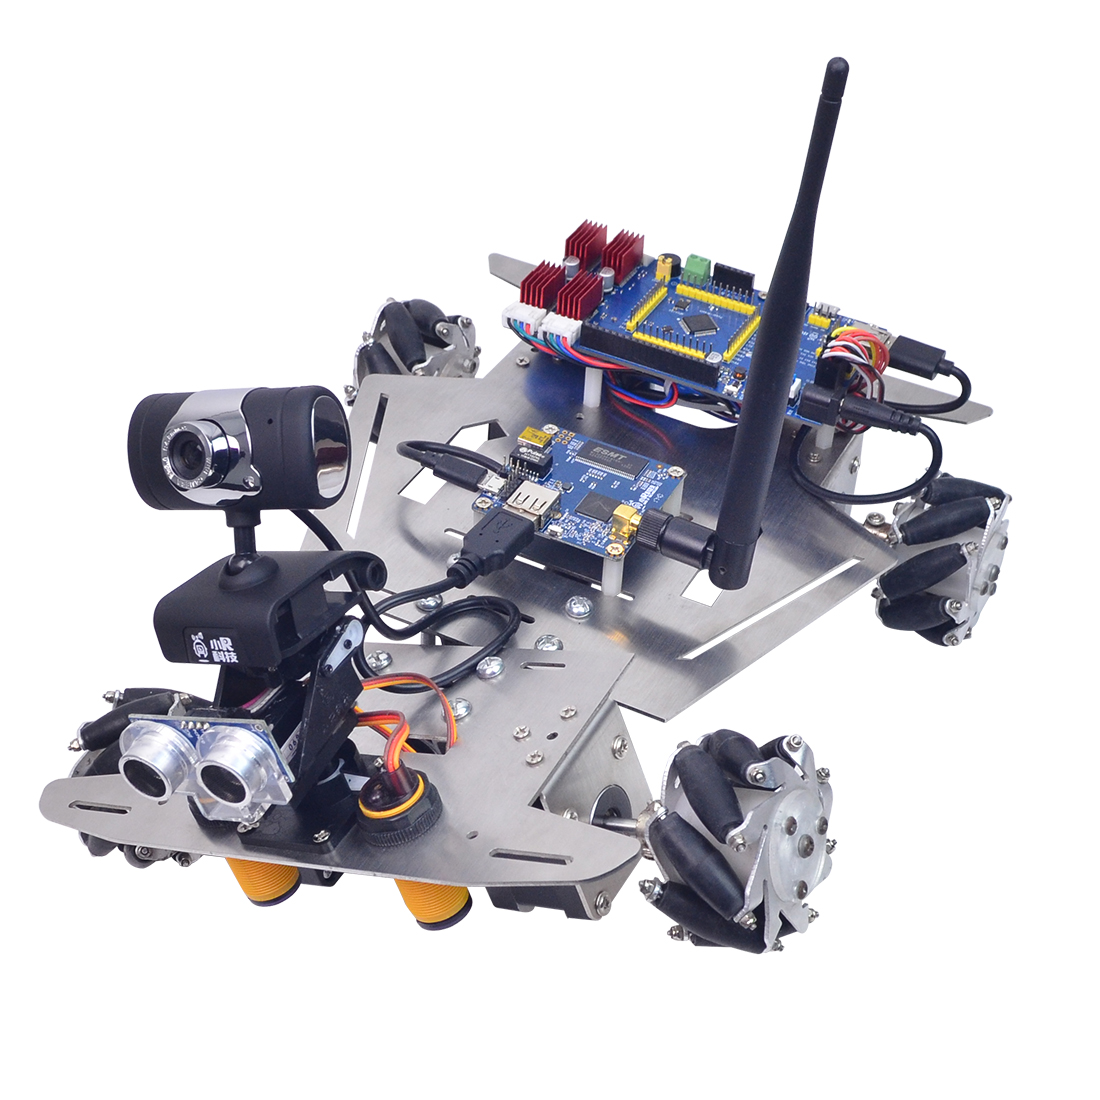 MODIKER Programmable Toys FOR XR Master Omni-directional Mecanum Wheel Robot High Tech Toys - WIFI Version